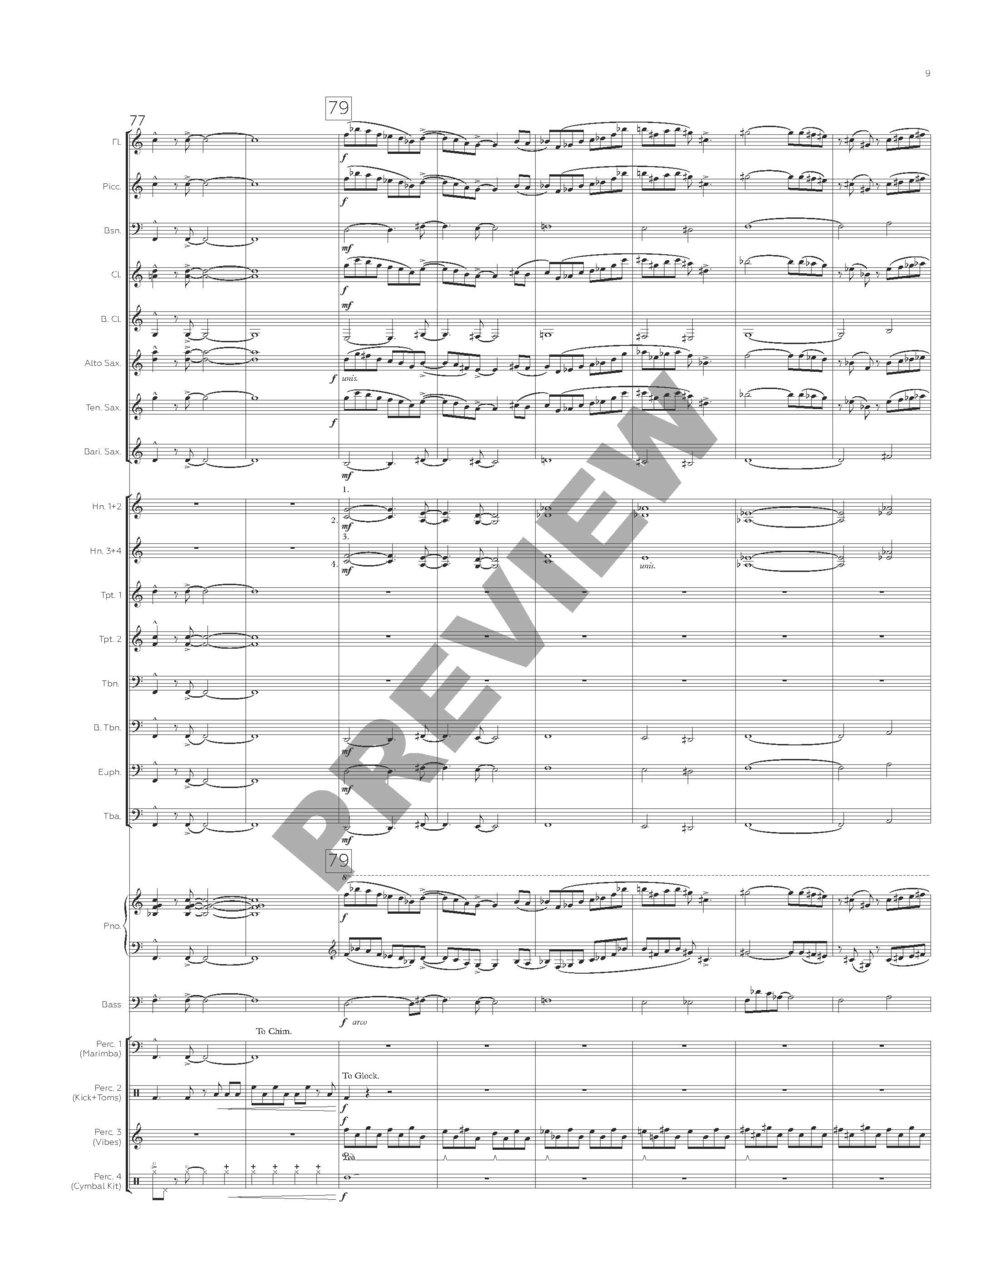 Melt this Pot - Full Score_Page_11.jpg